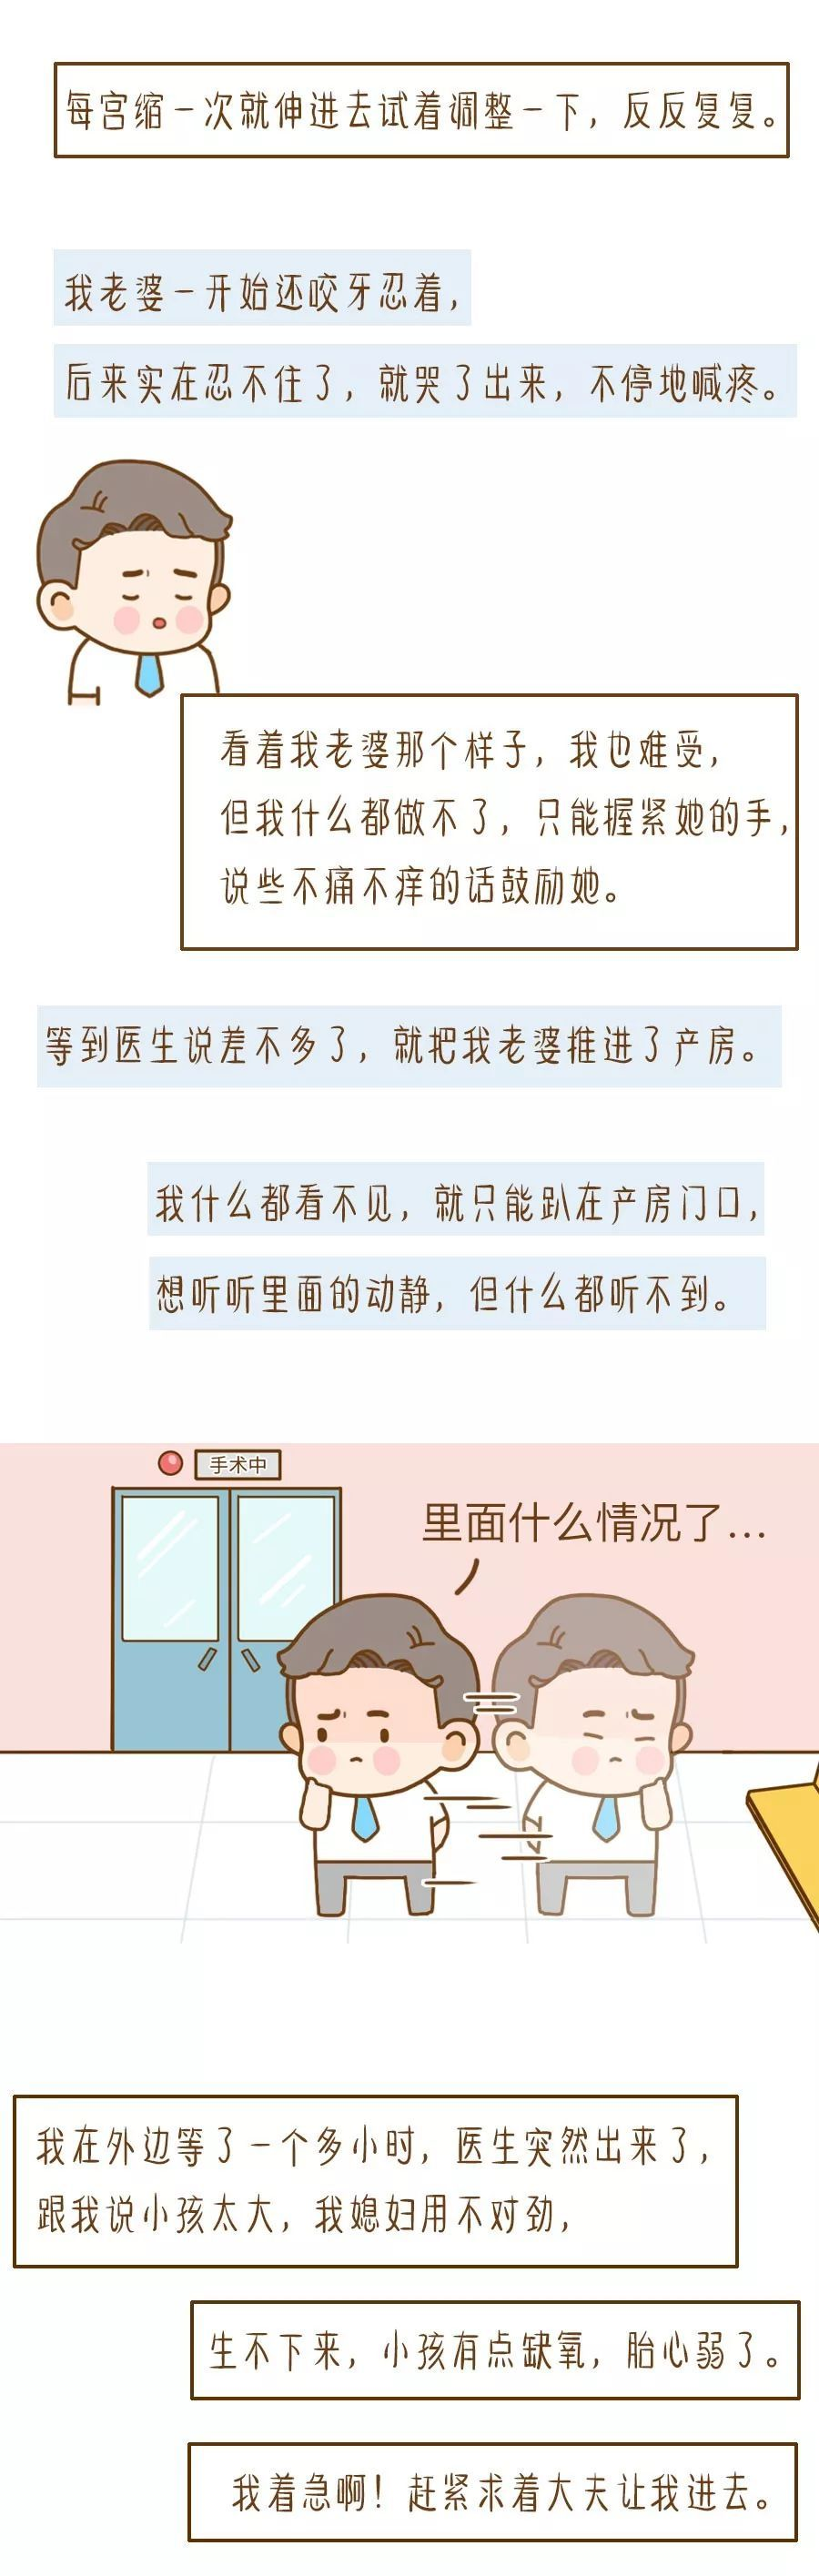 wellbet官方网站登录 7